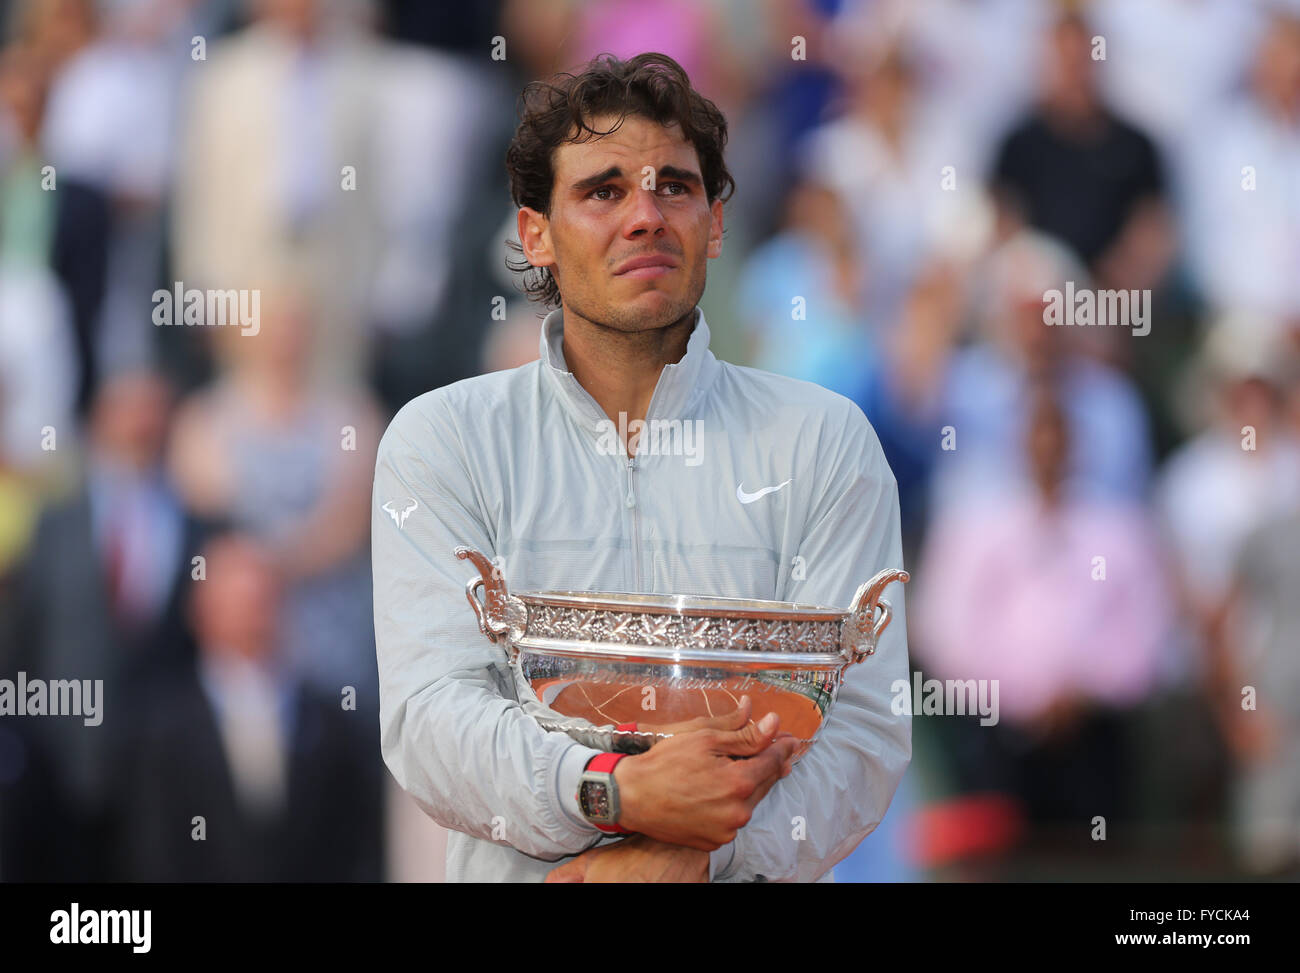 Rafael Nadal, ESP, reagieren emotional während der Preisverleihung, 2014, French Open, Roland Garros, Paris, Stockbild